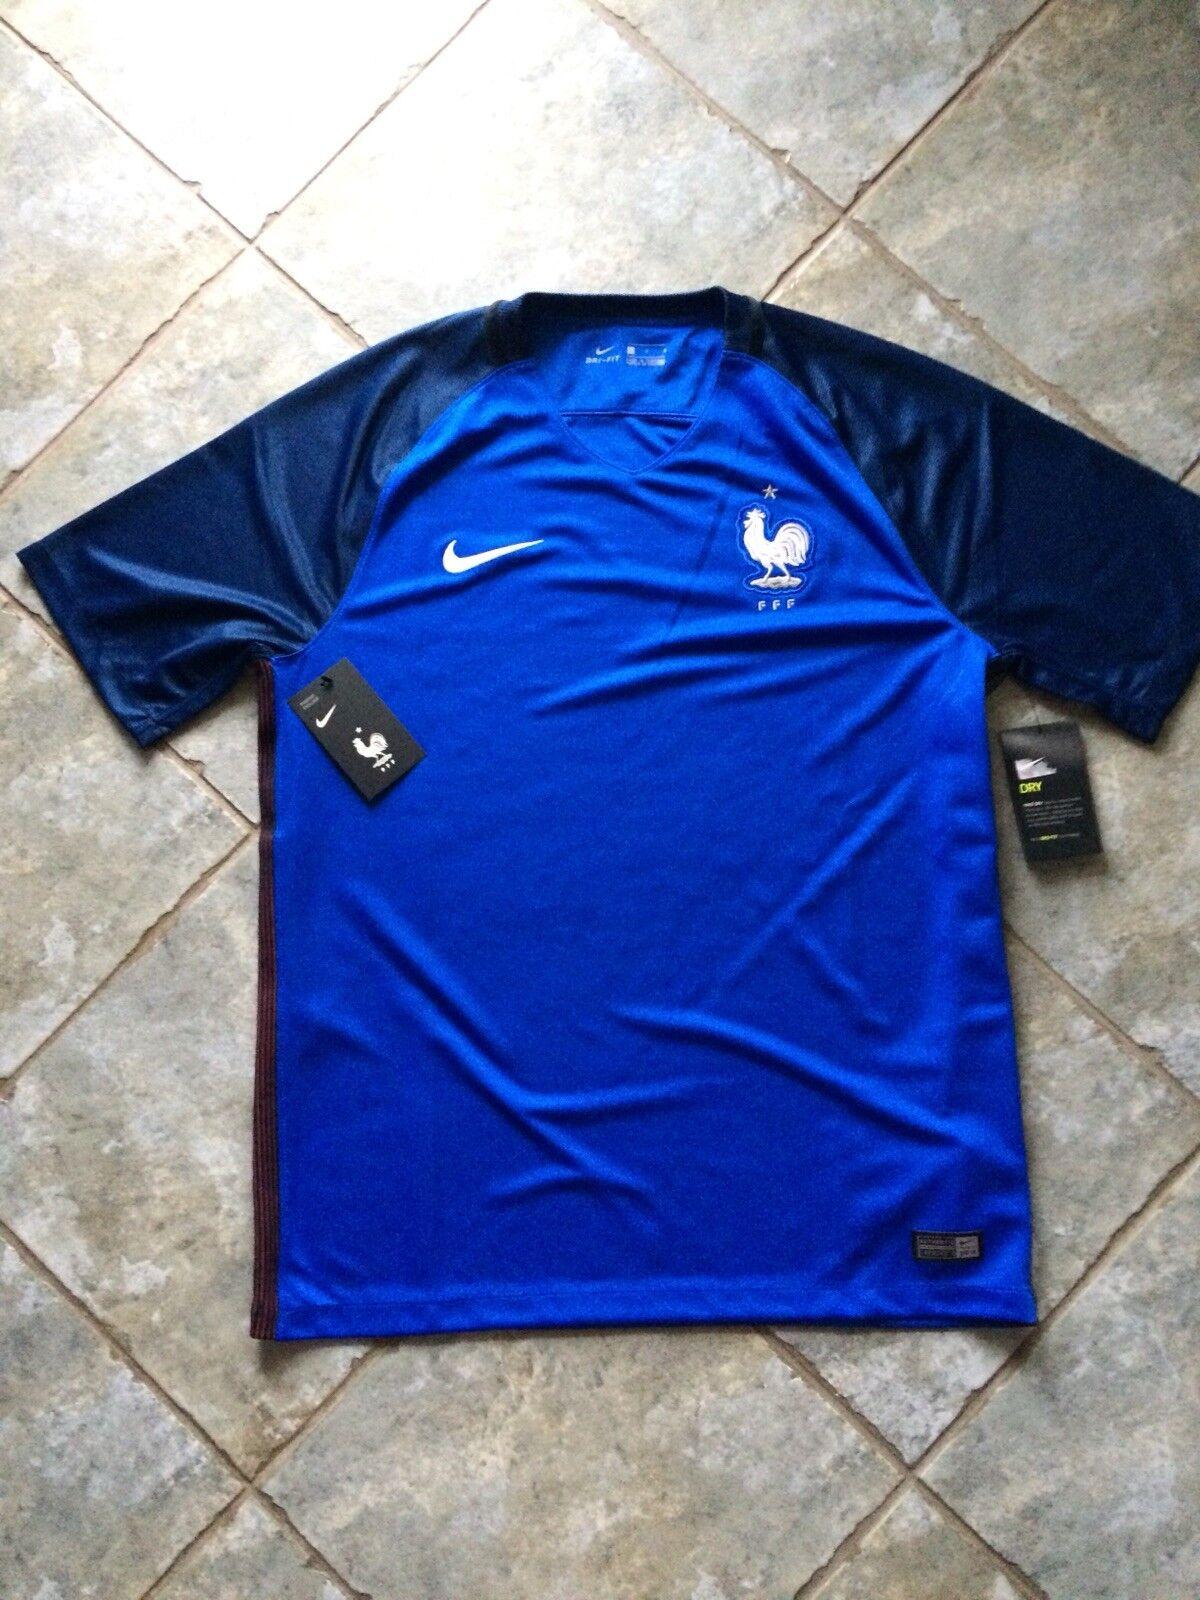 NIKE FRANKREICH FRANCE 2016 NATIONAL Fussballtrikot L NEU